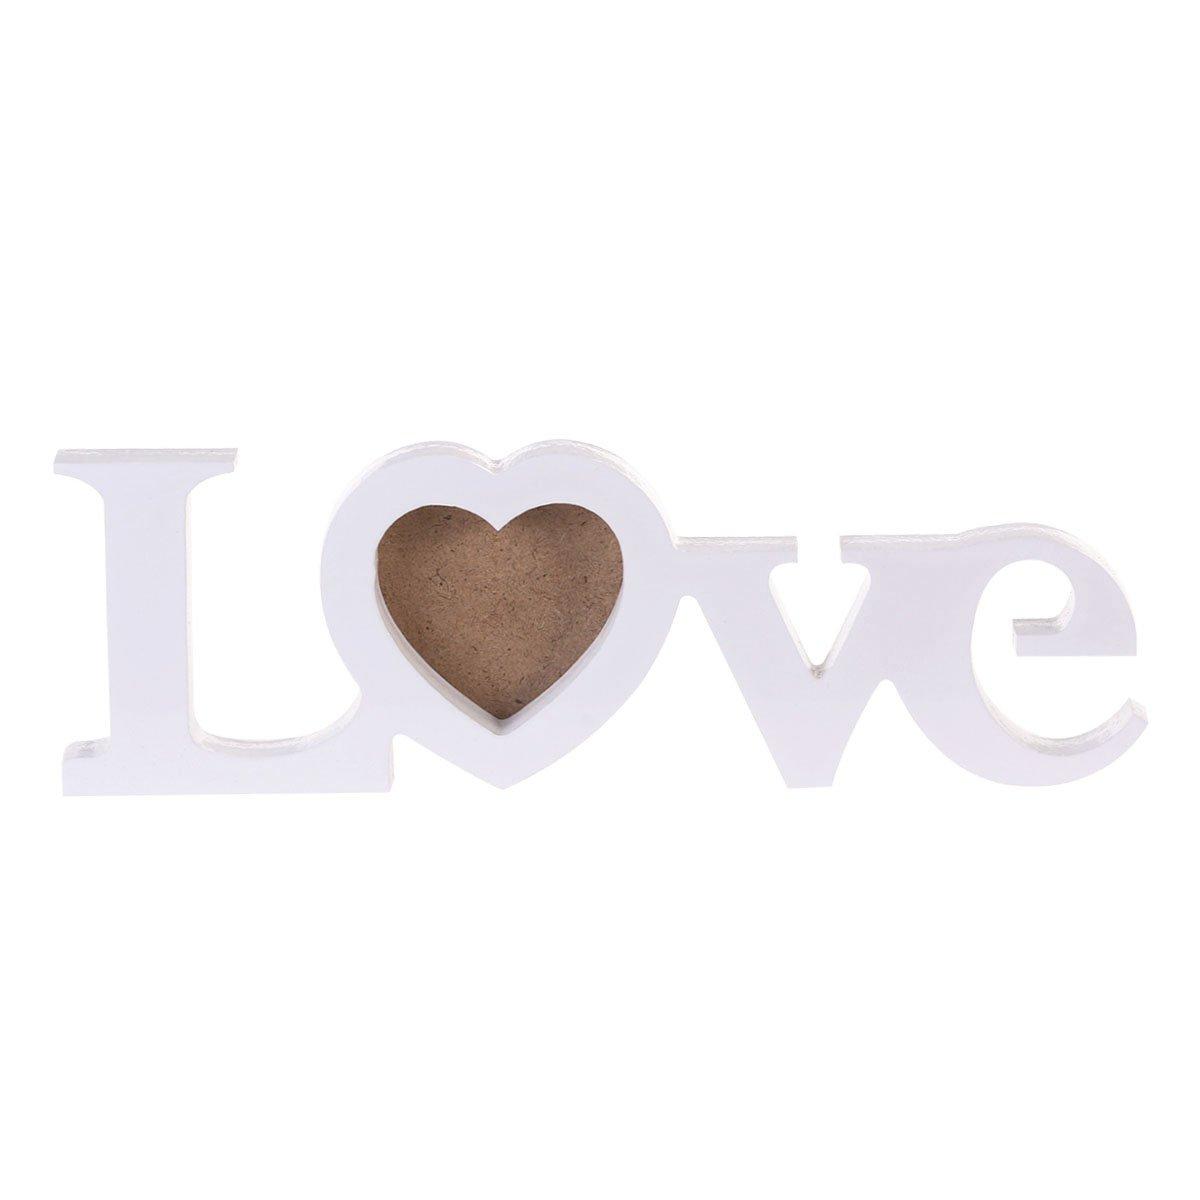 Amazon.com: WINOMO 3-Inch LOVE photo frame DIY Wedding Picture Frame Wooden Craft Photo Frame (White): Home & Kitchen